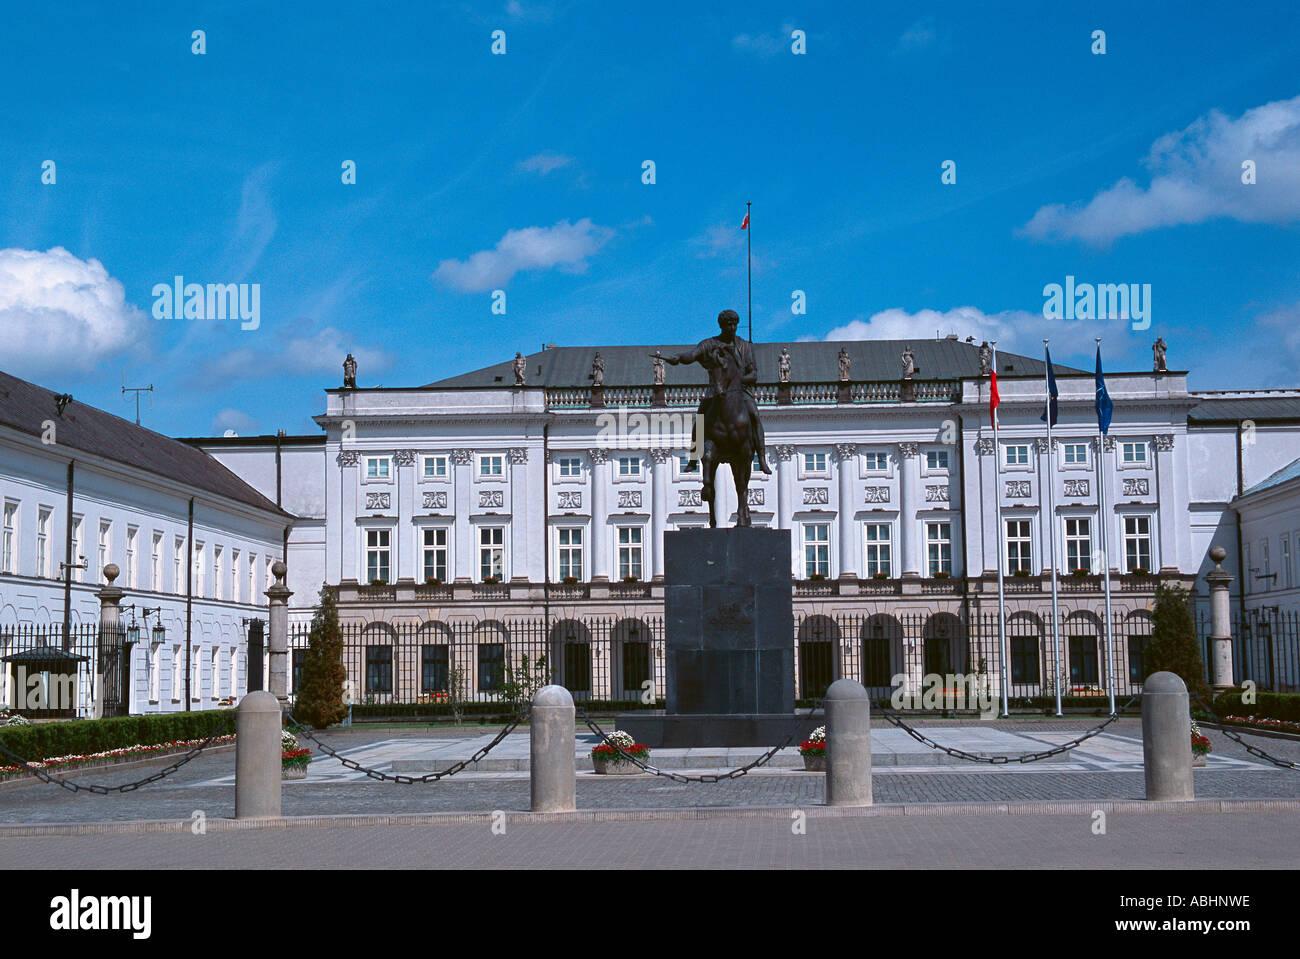 Radziwill Palast Royal Art Warschau Polen Stockfoto, Bild: 7371101 ...